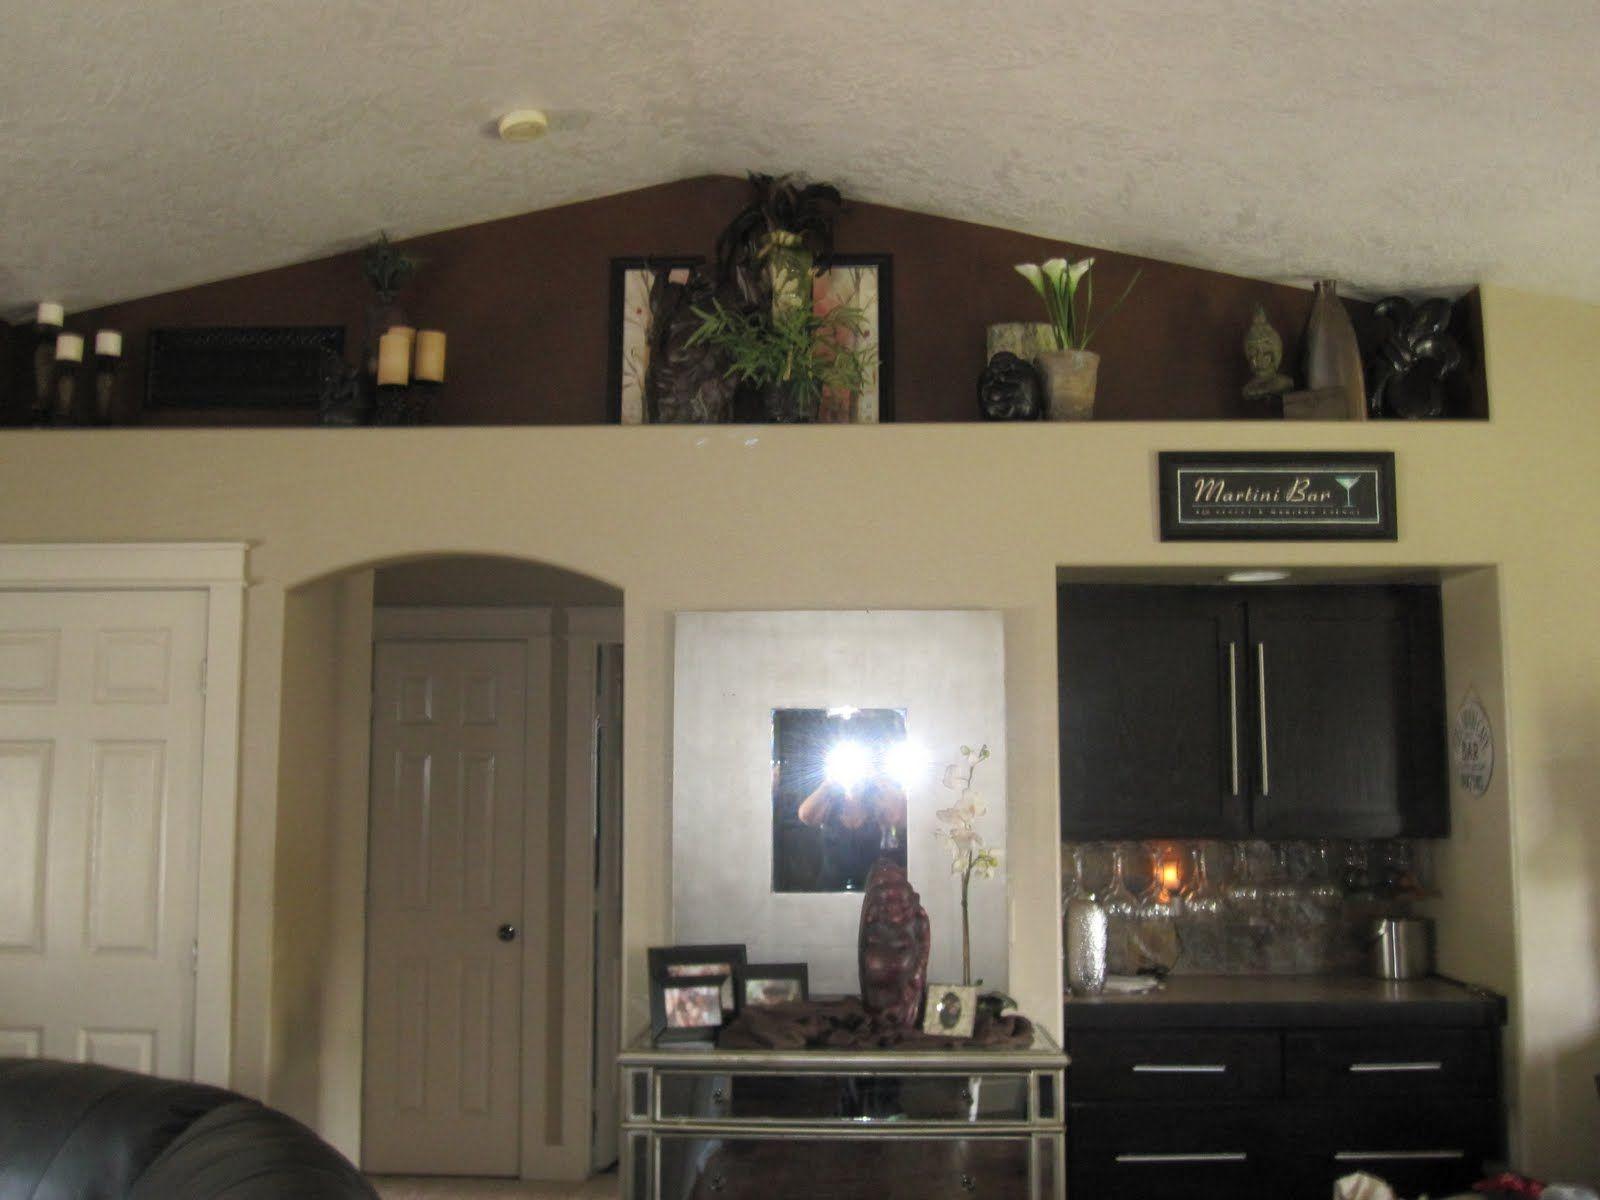 Decorate my house like a bar